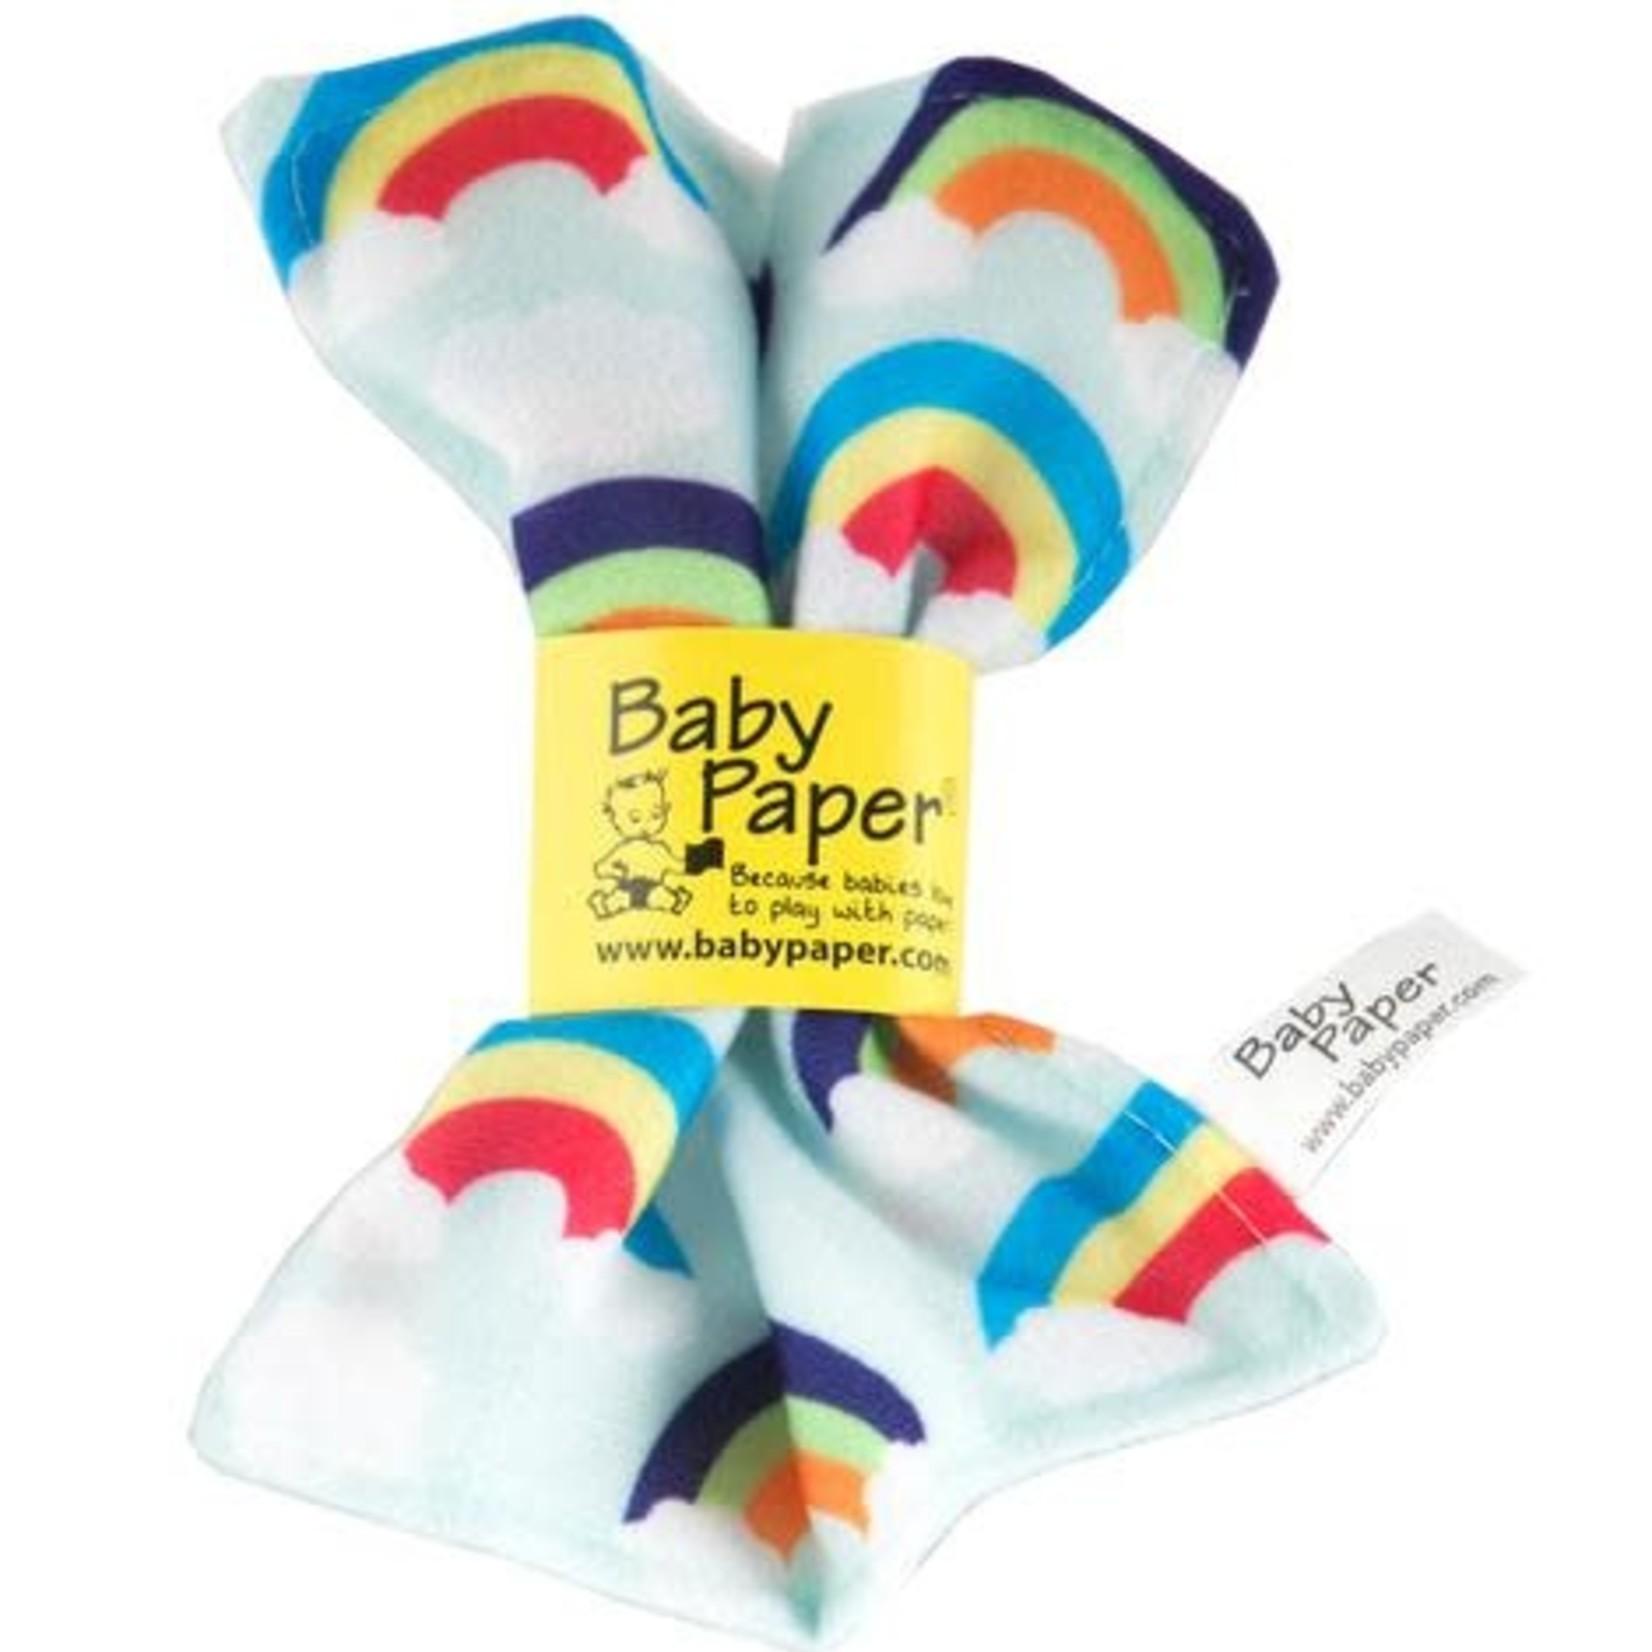 Baby Paper Baby Paper - Rainbows